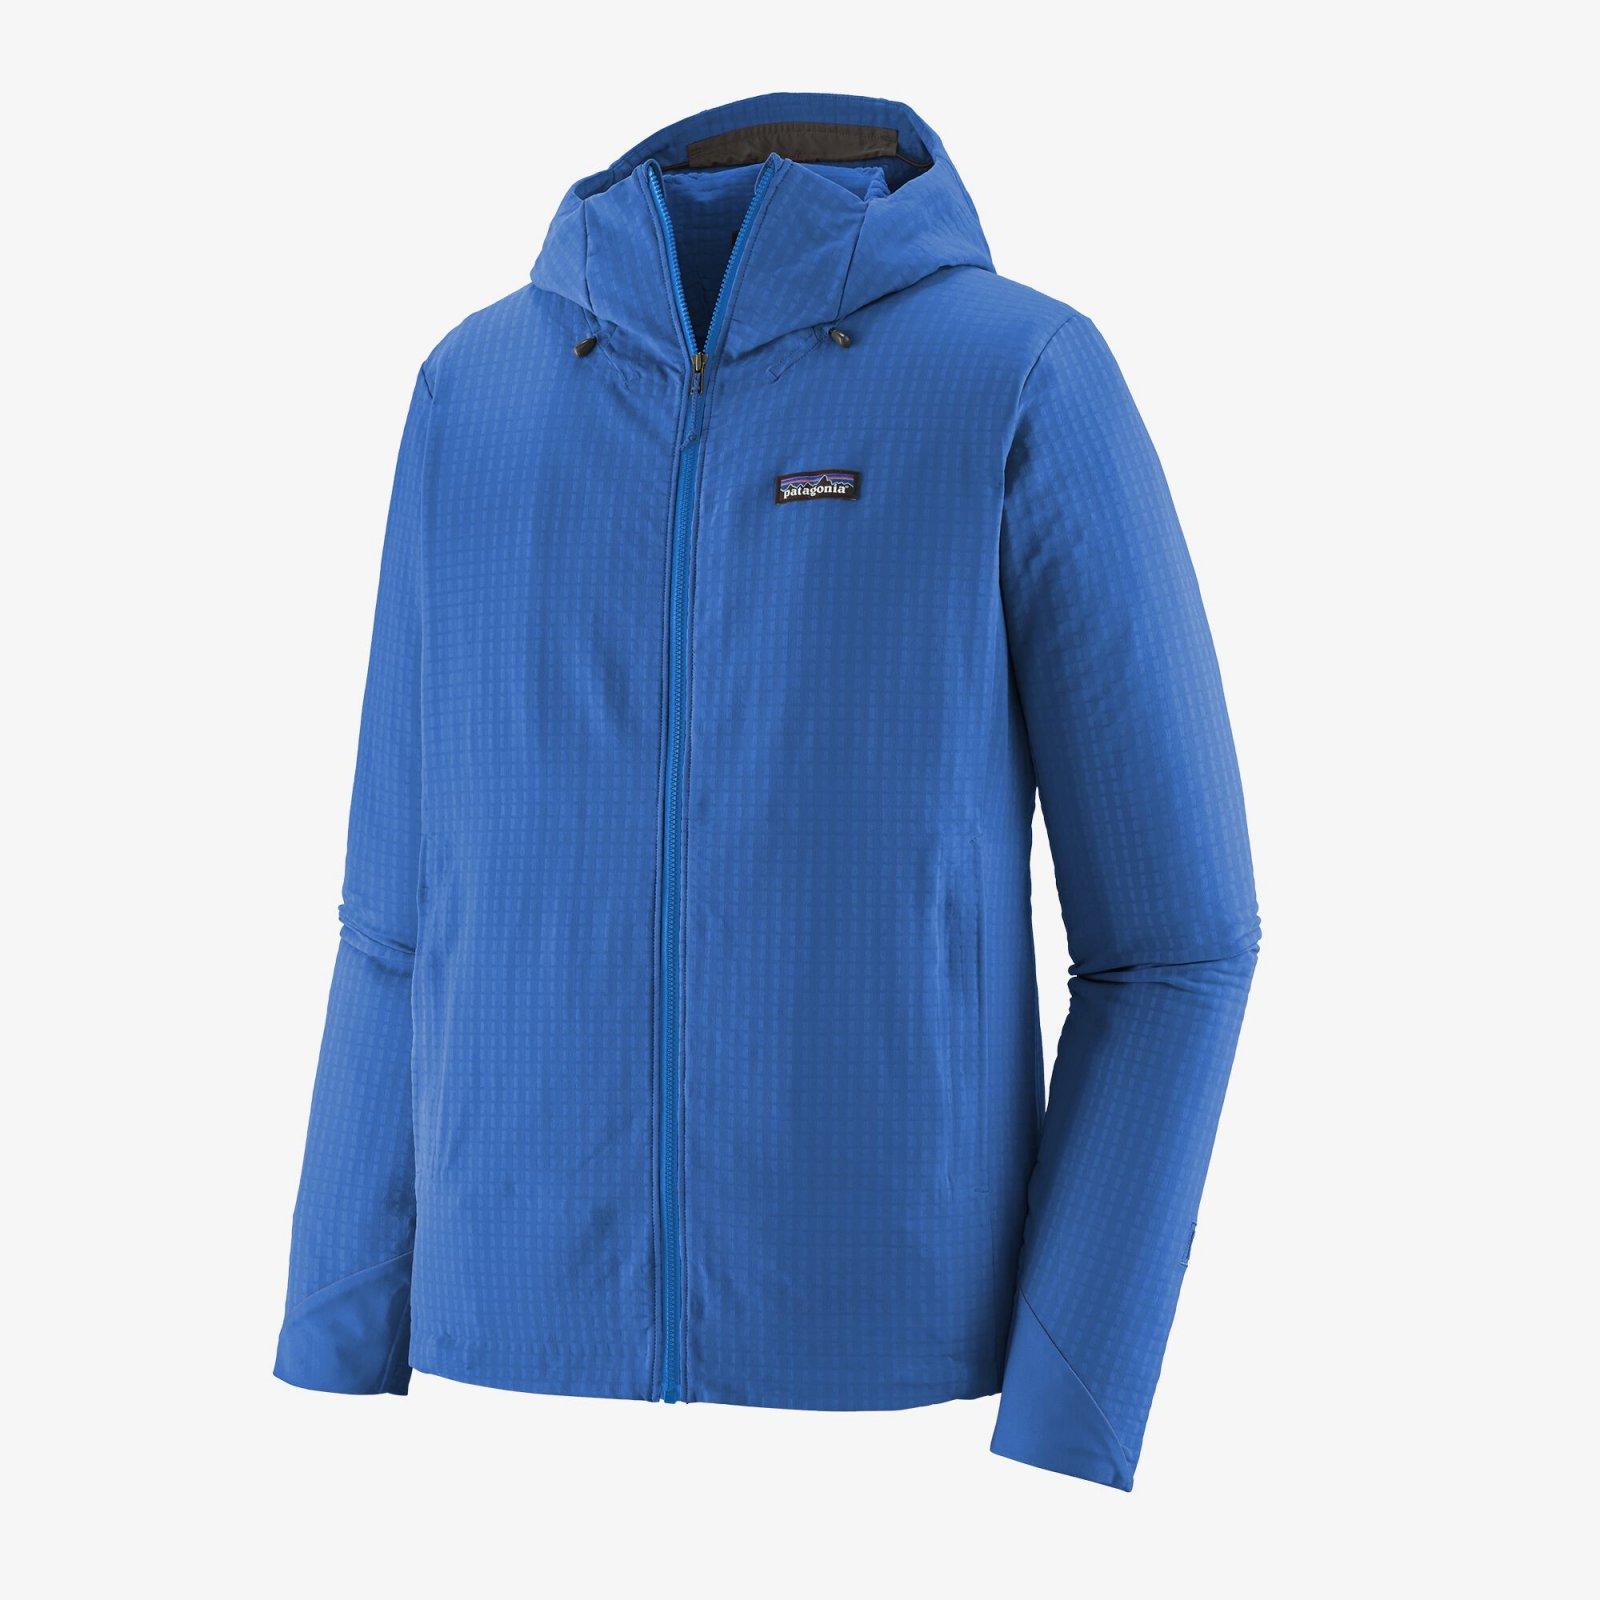 Men's Patagonia R1 TechFace Hoody - Superior Blue